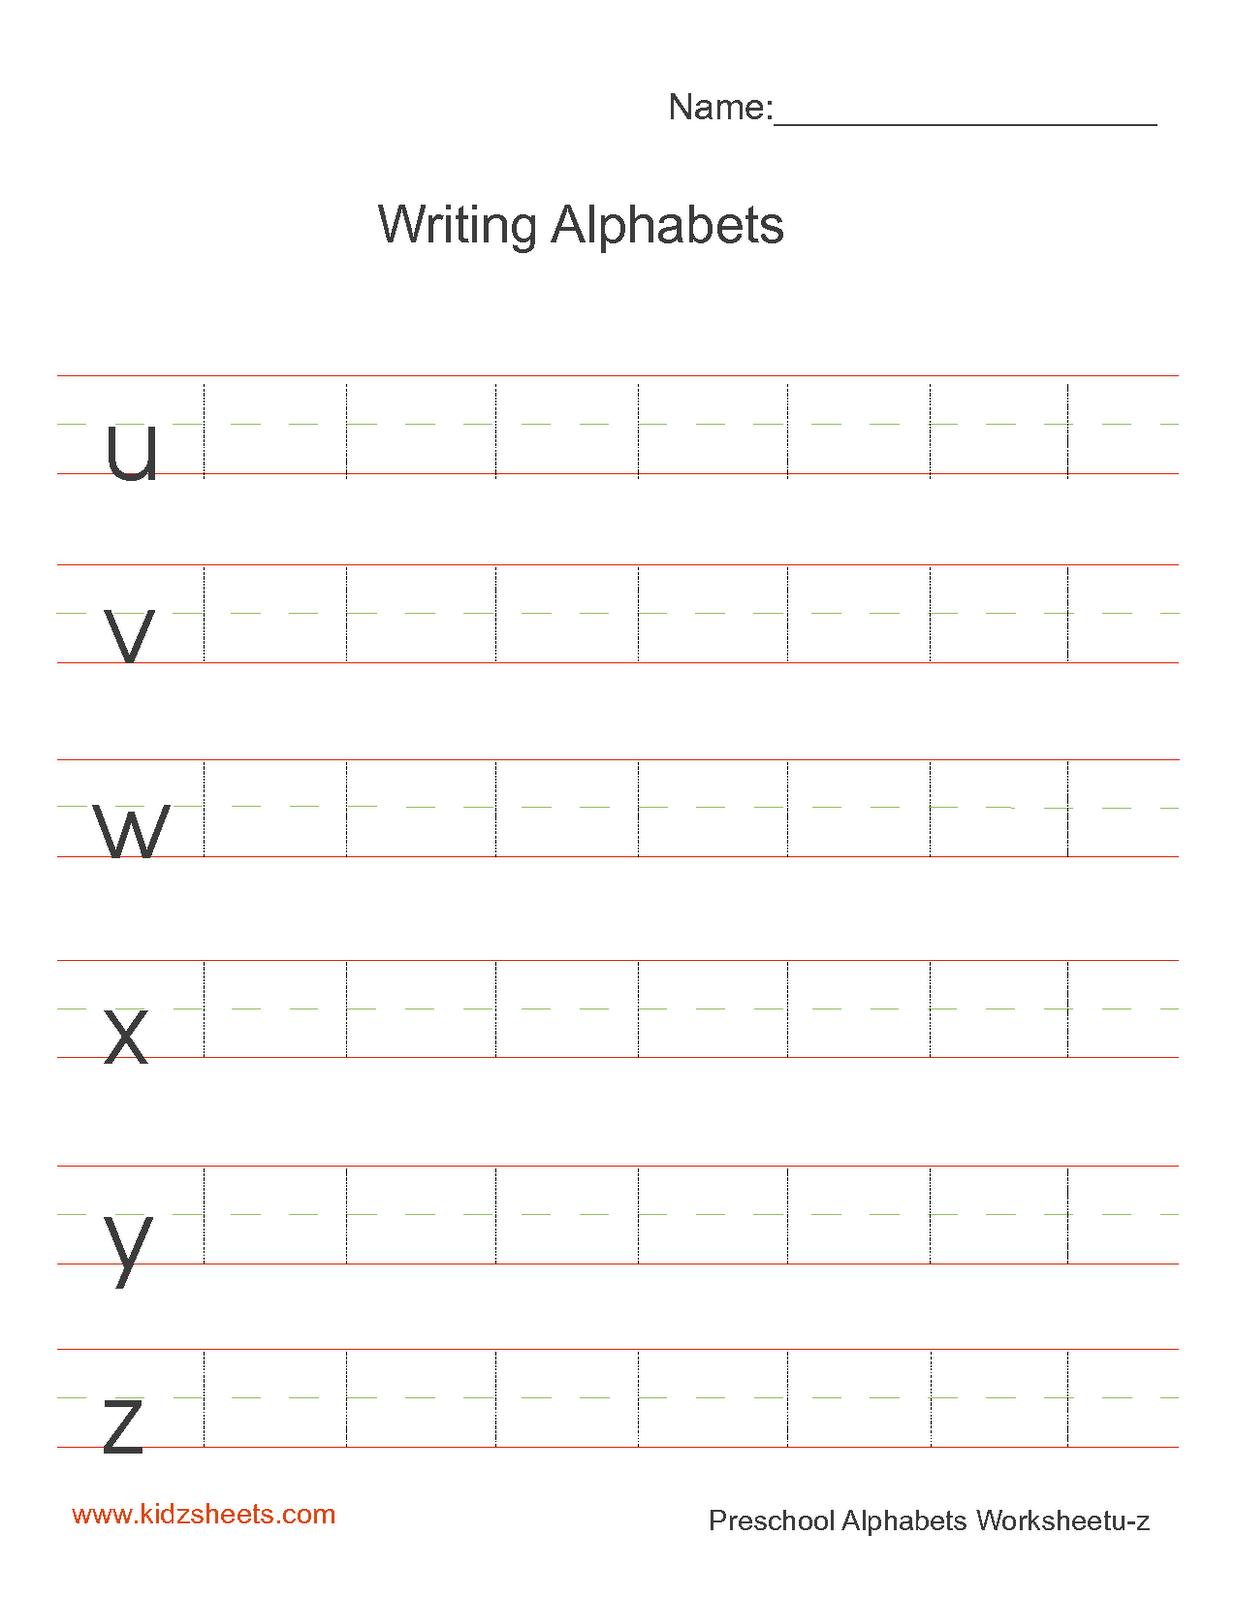 Kidz Worksheets Preschool Writing Alphabets Worksheet5